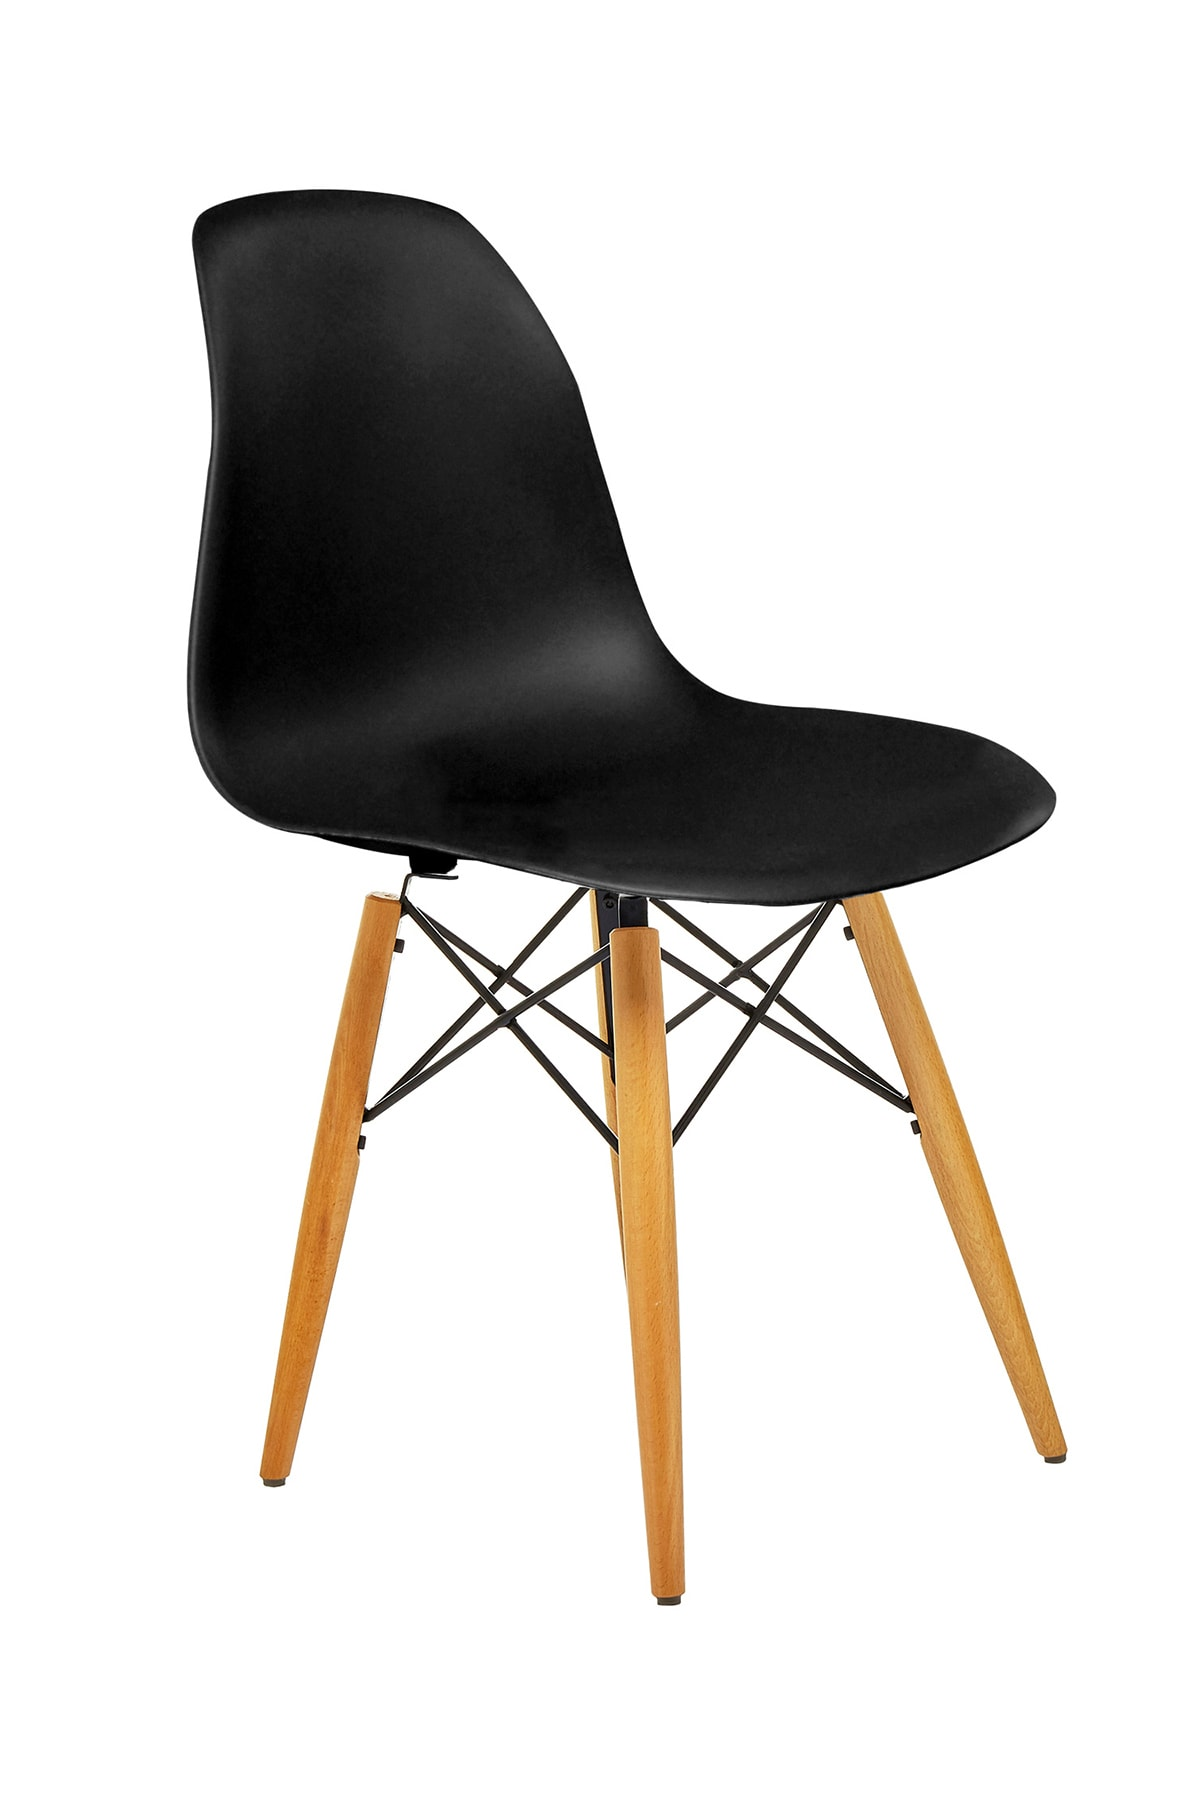 Siyah Eames Sandalye - Natural Ahşap Ayaklı